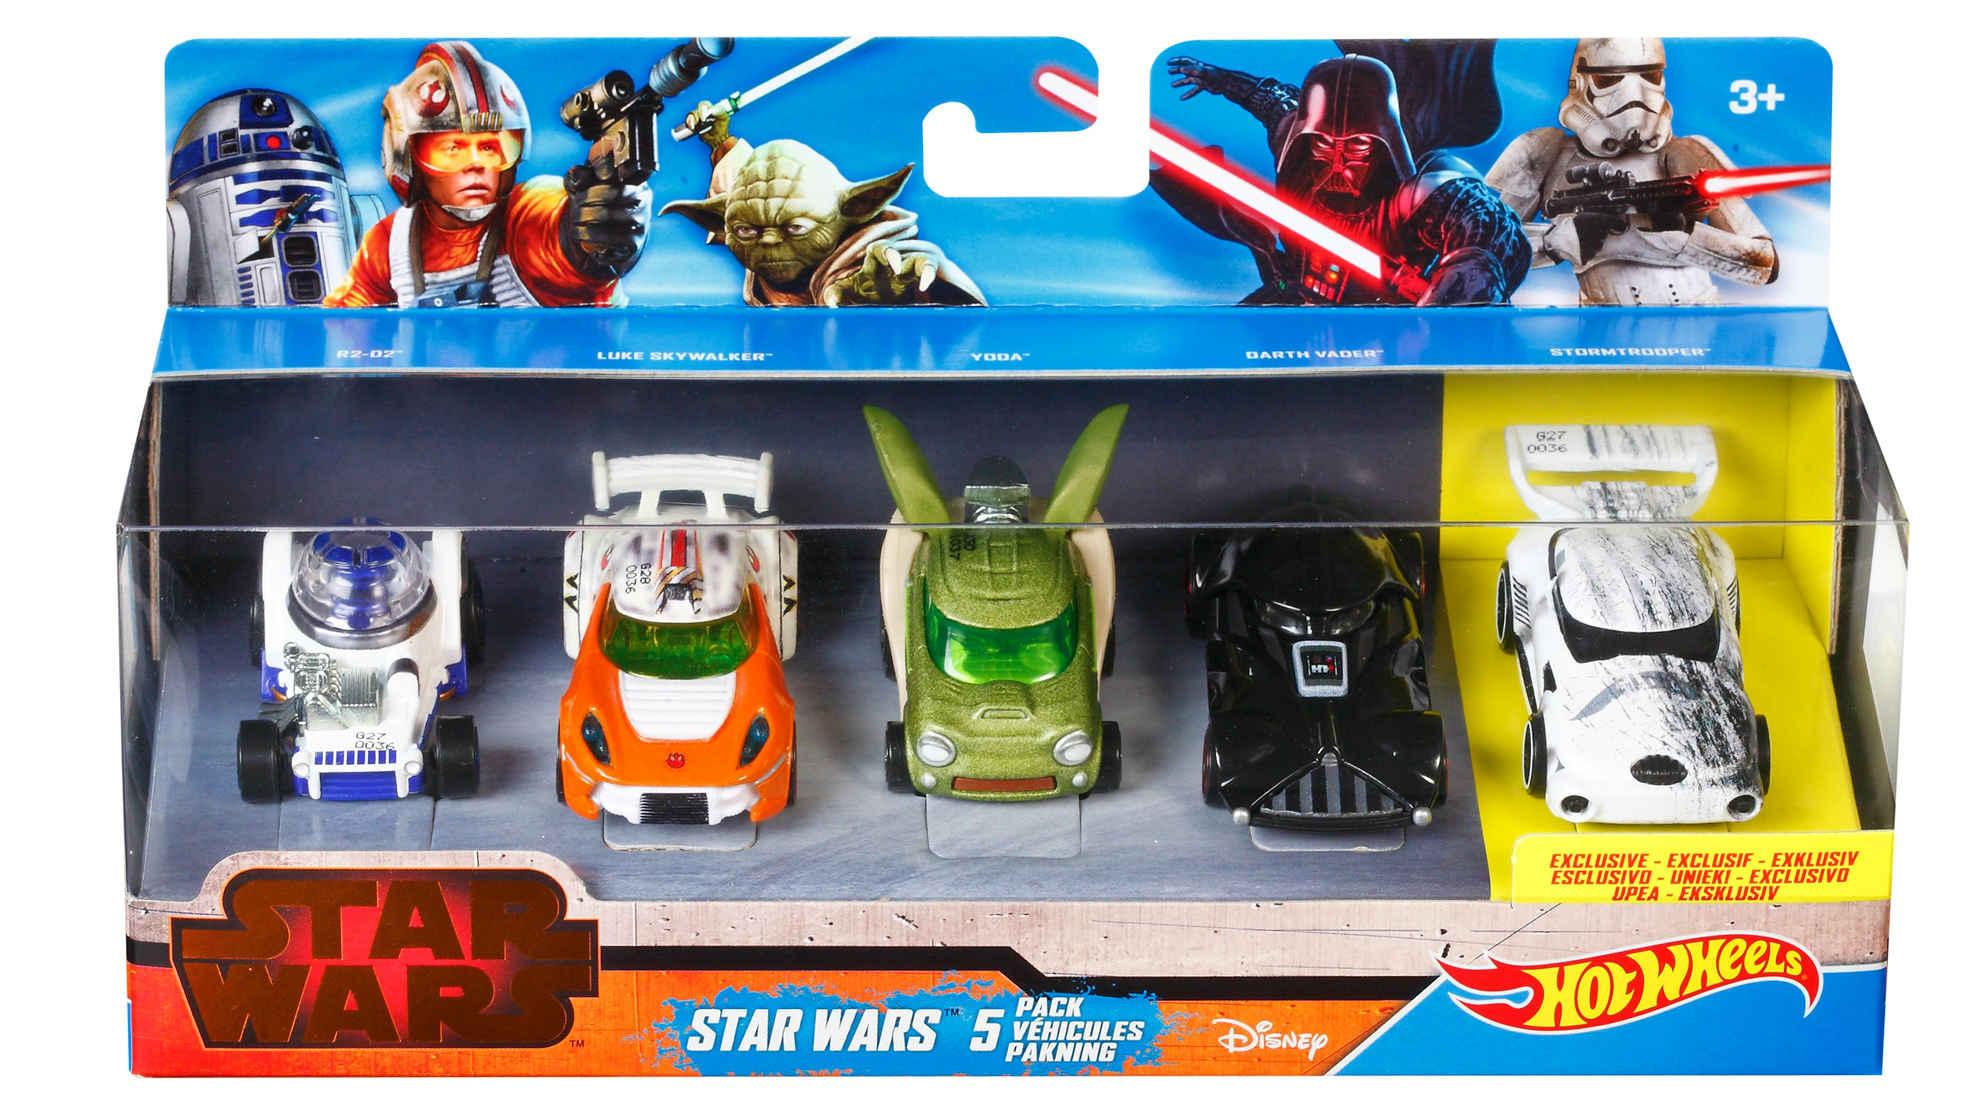 10 superpojazdów Star Wars od Hot Wheels